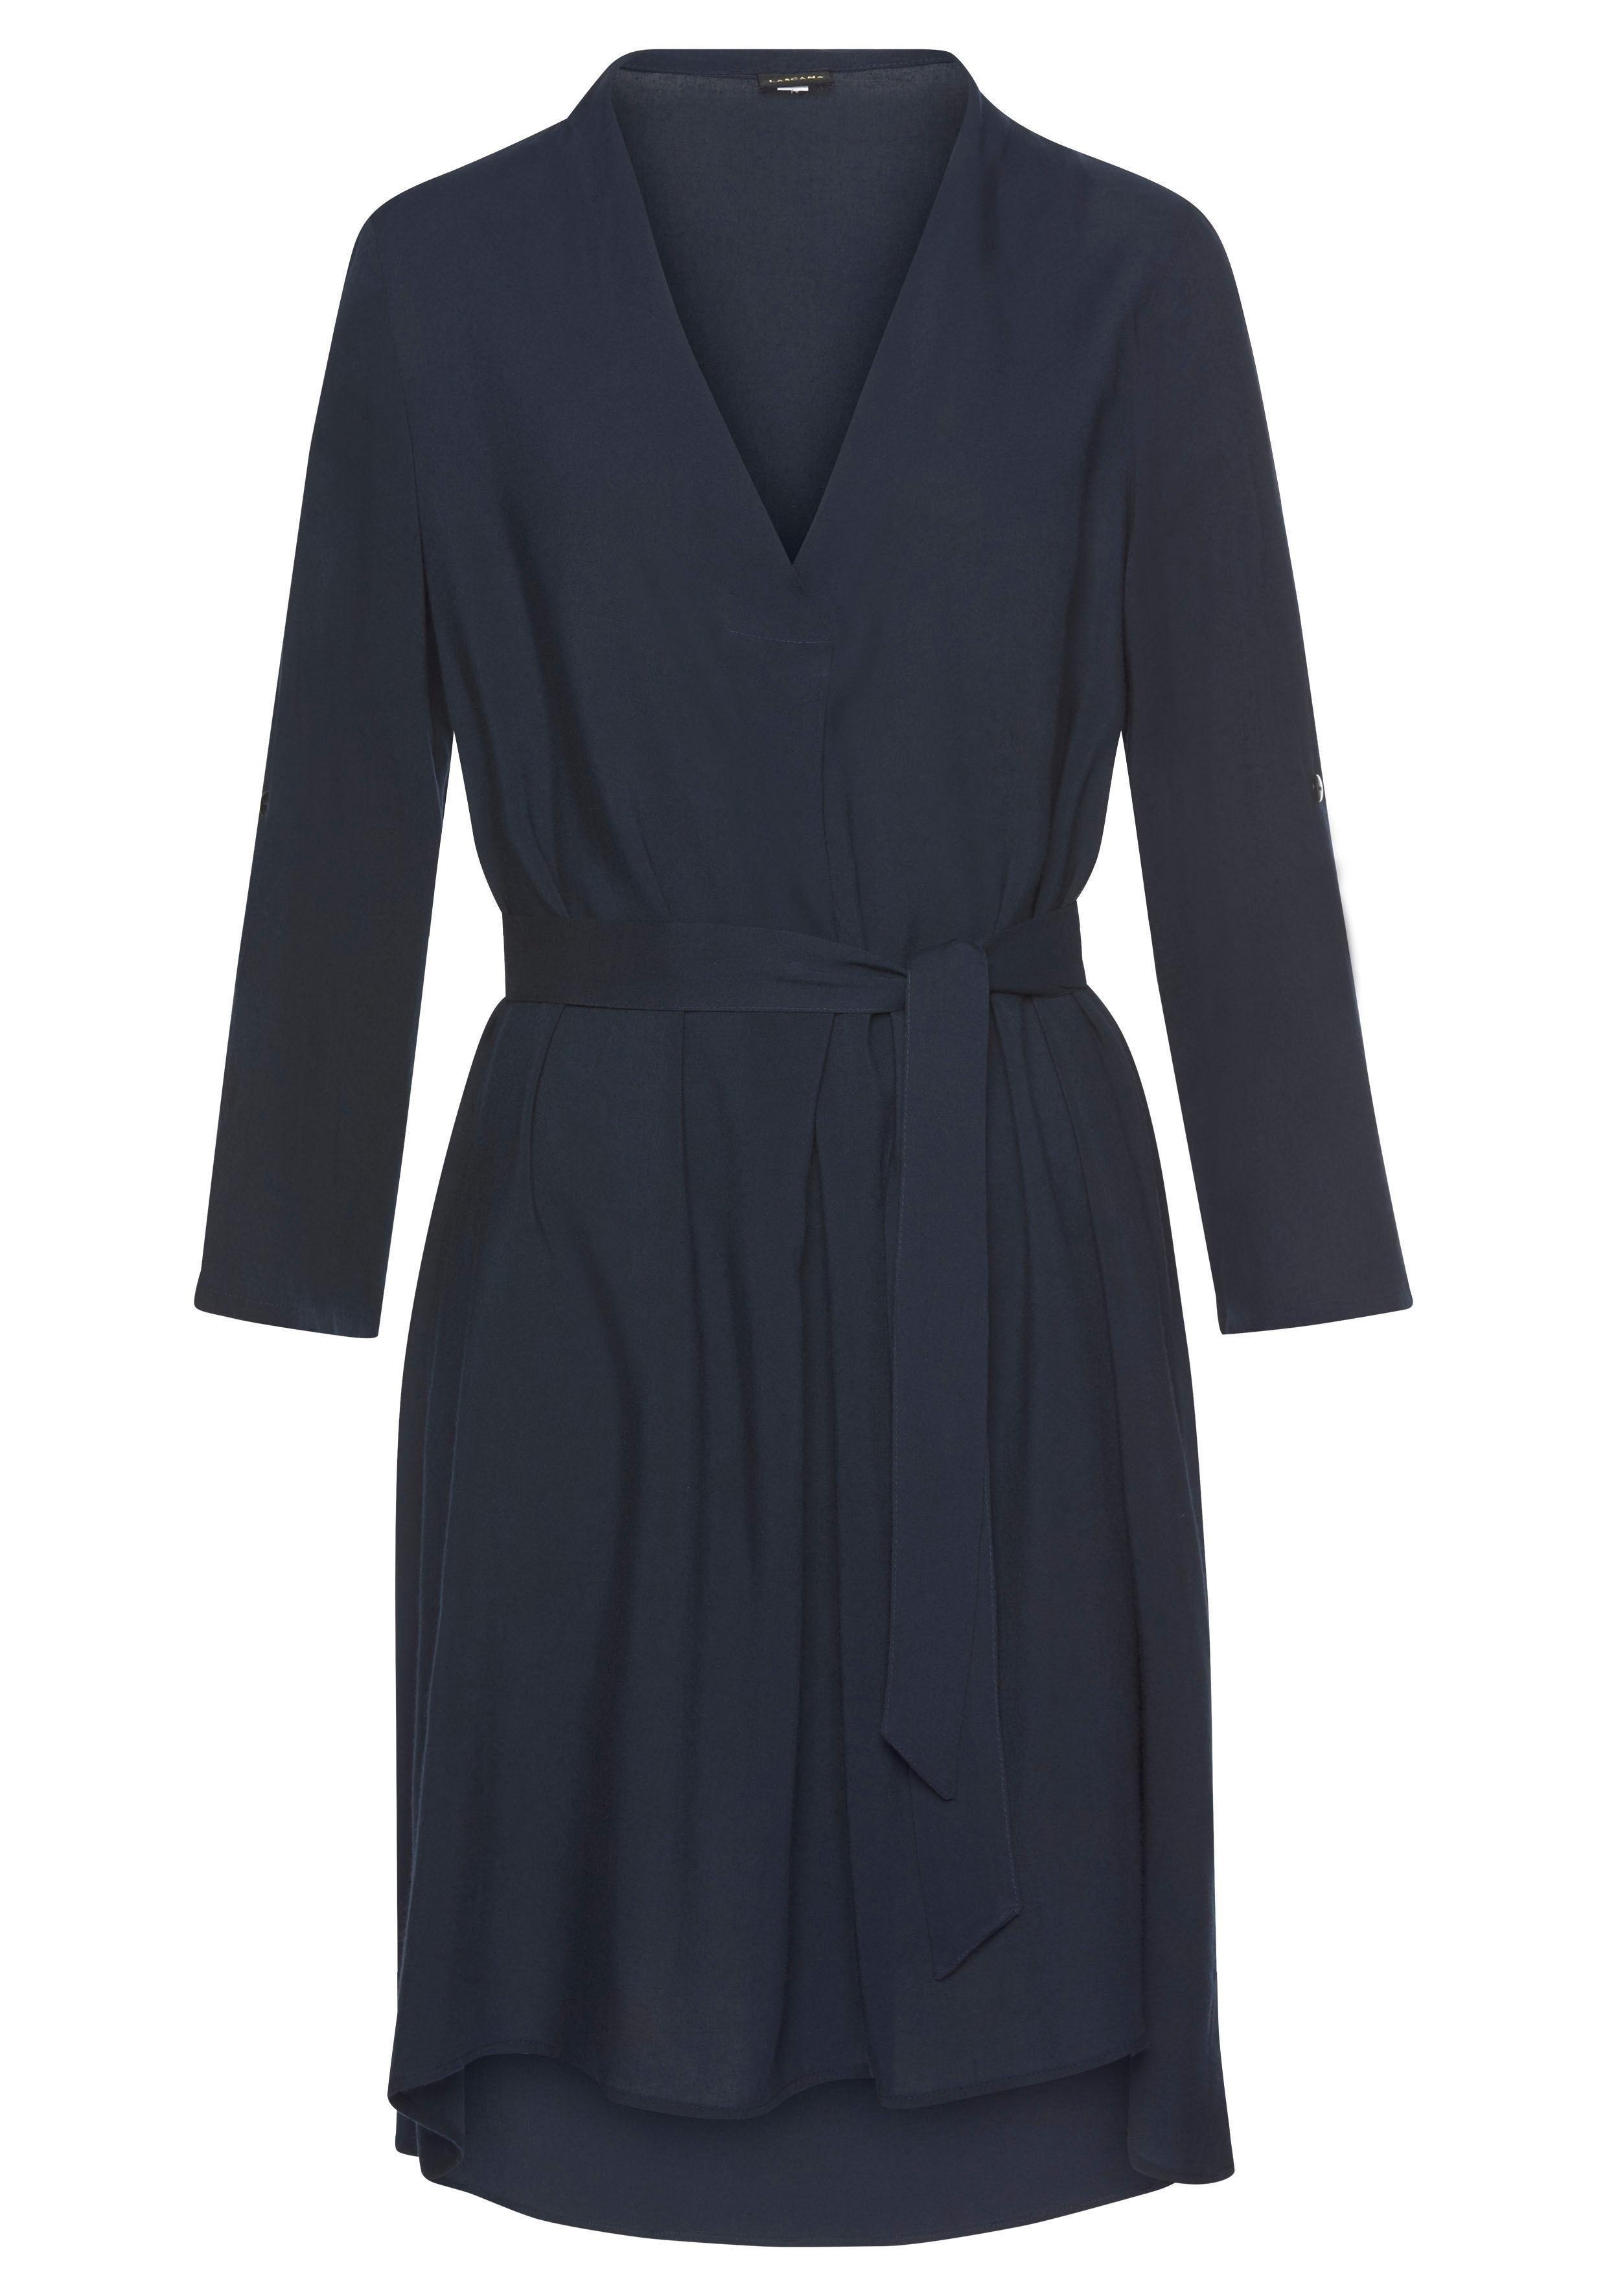 LASCANA blousejurkje voordelig en veilig online kopen